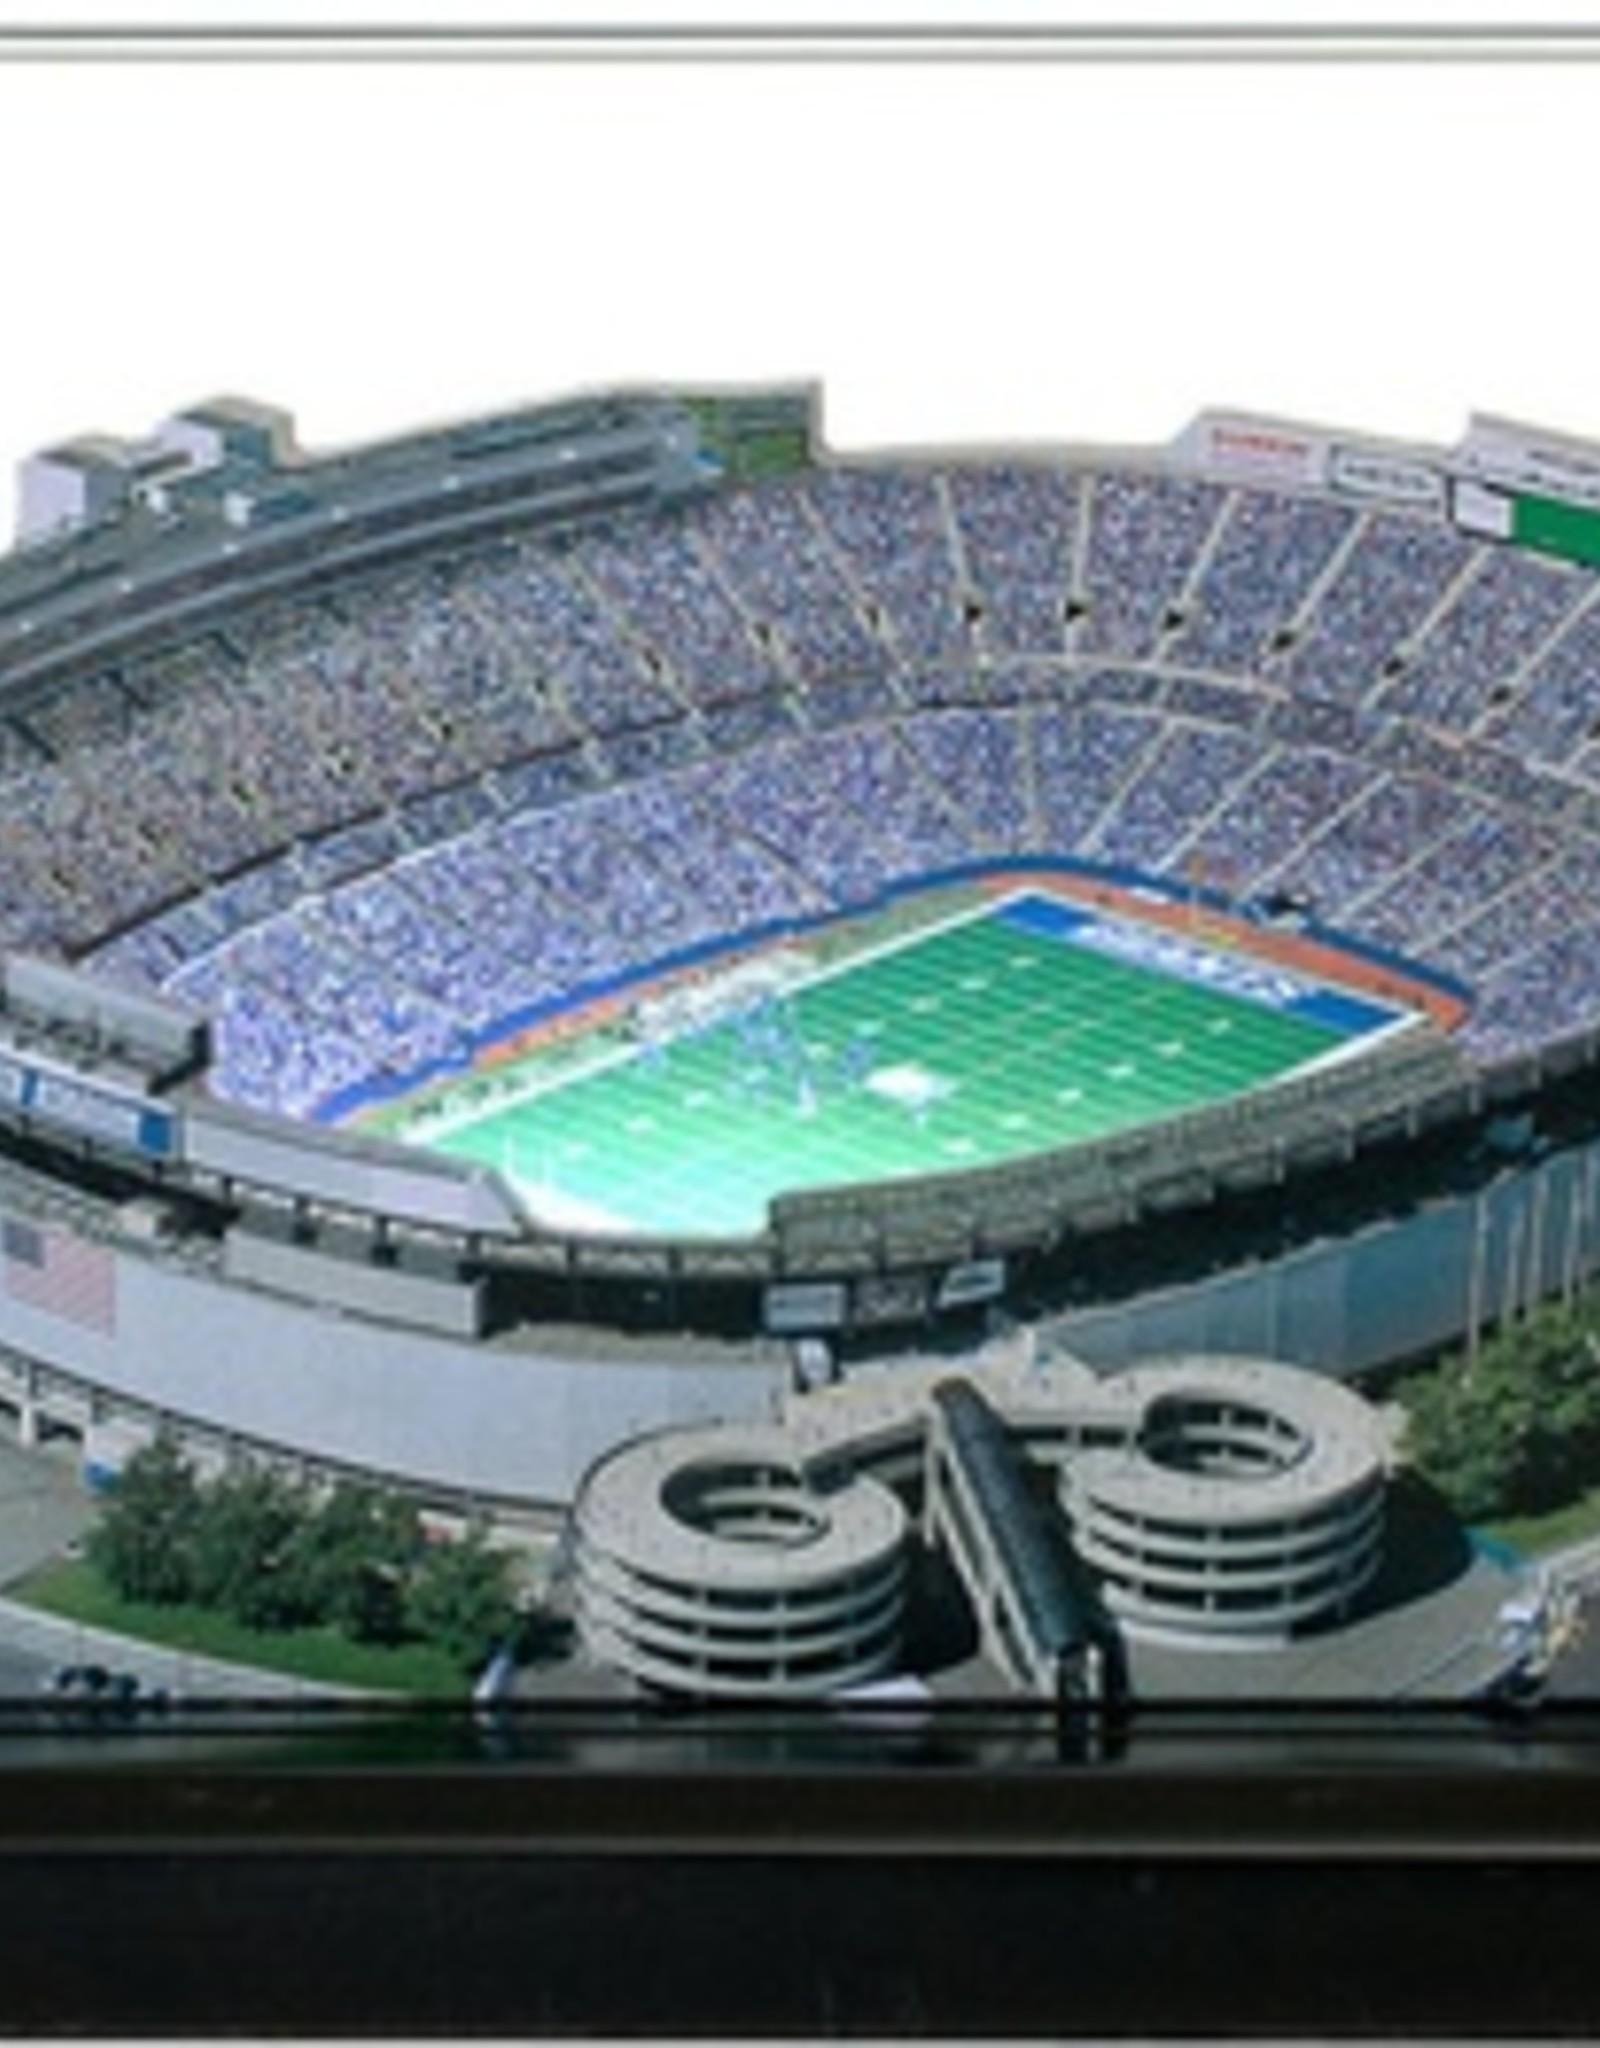 HOMEFIELDS New York Giants 9in Lighted Replica Giants Stadium (1976-2009)